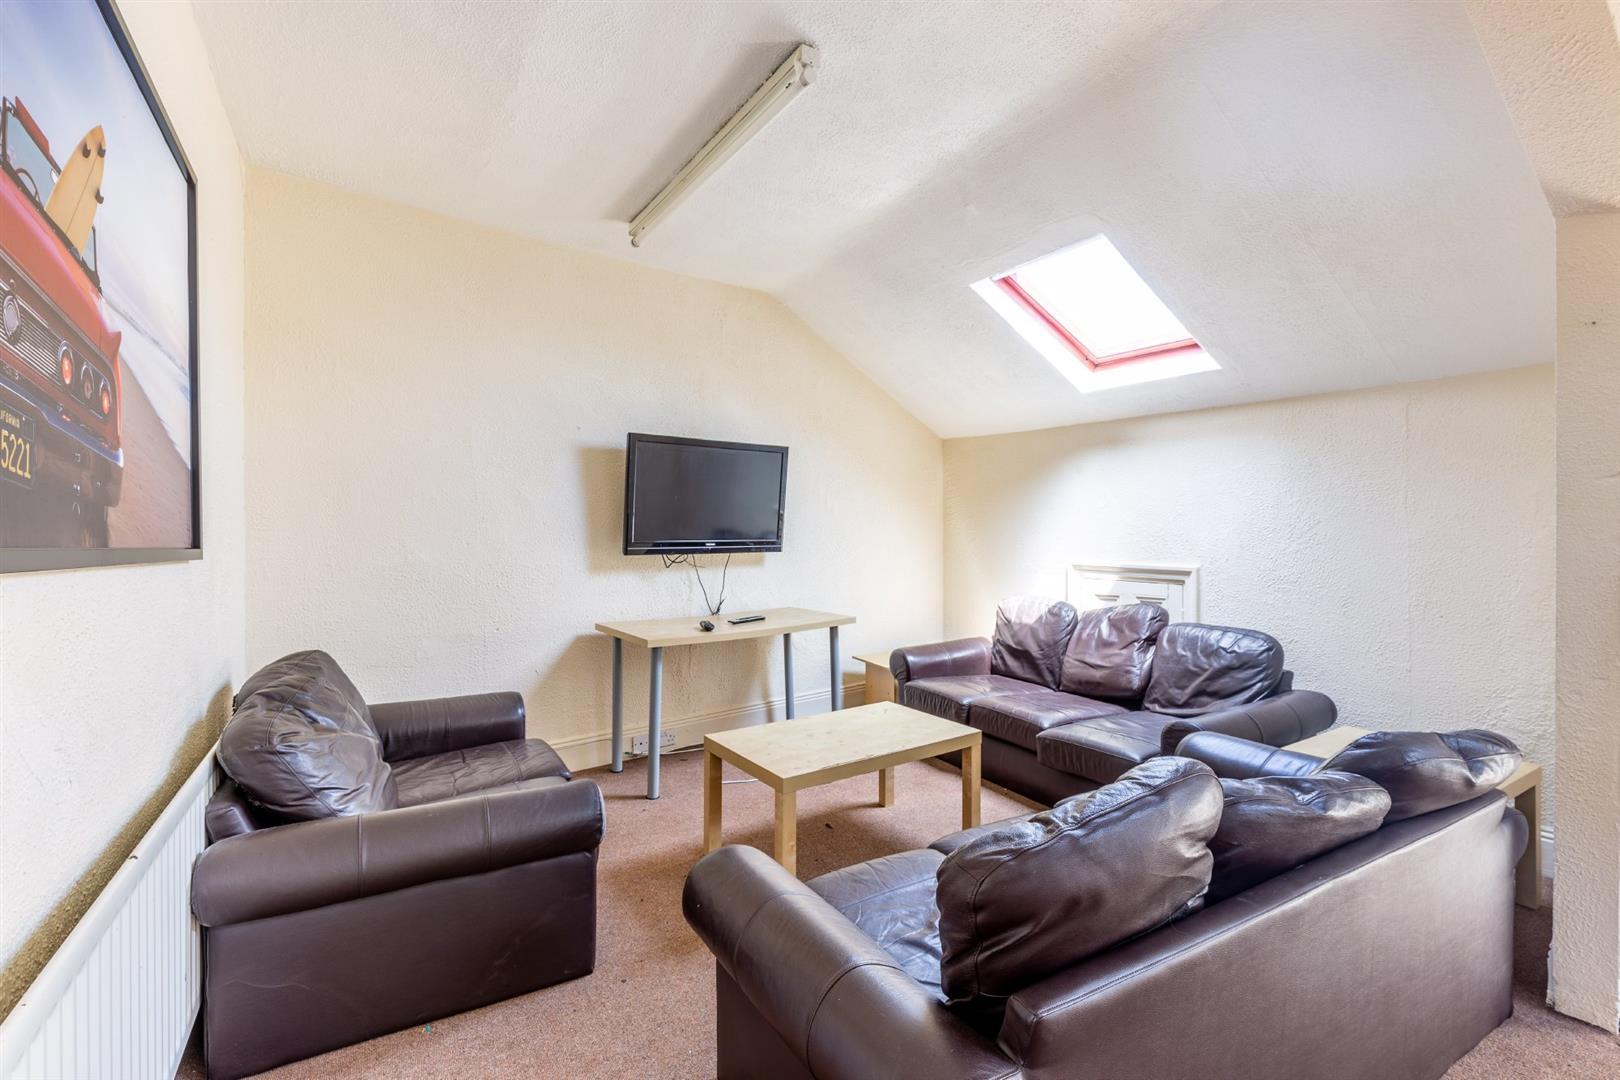 4 bed maisonette to rent in Newcastle Upon Tyne, NE6 5HL 0